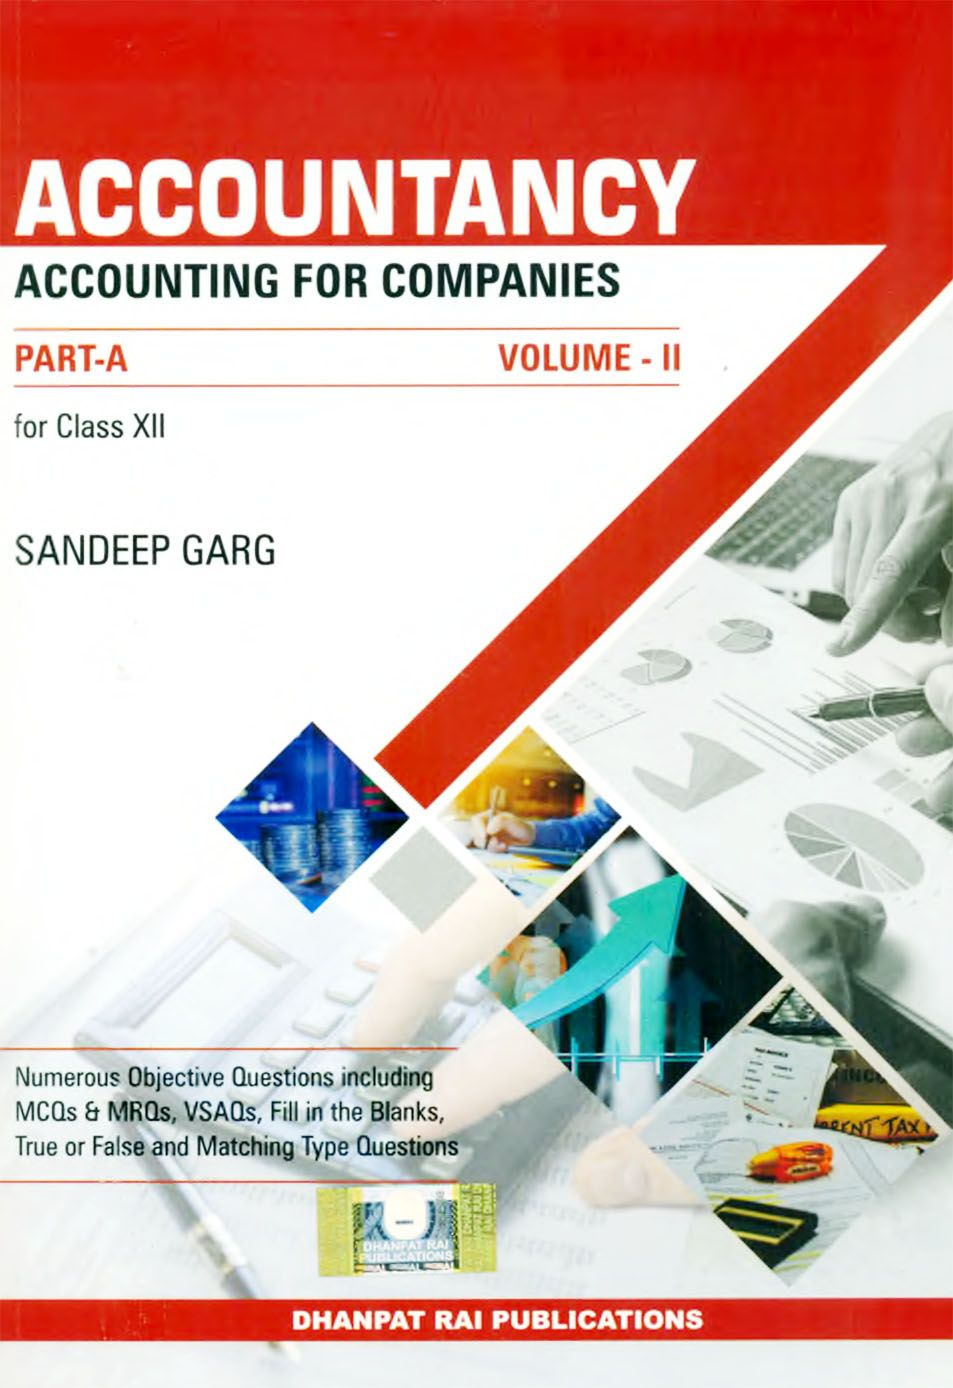 Accountancy PartA VolumeII for Class XII in 2020